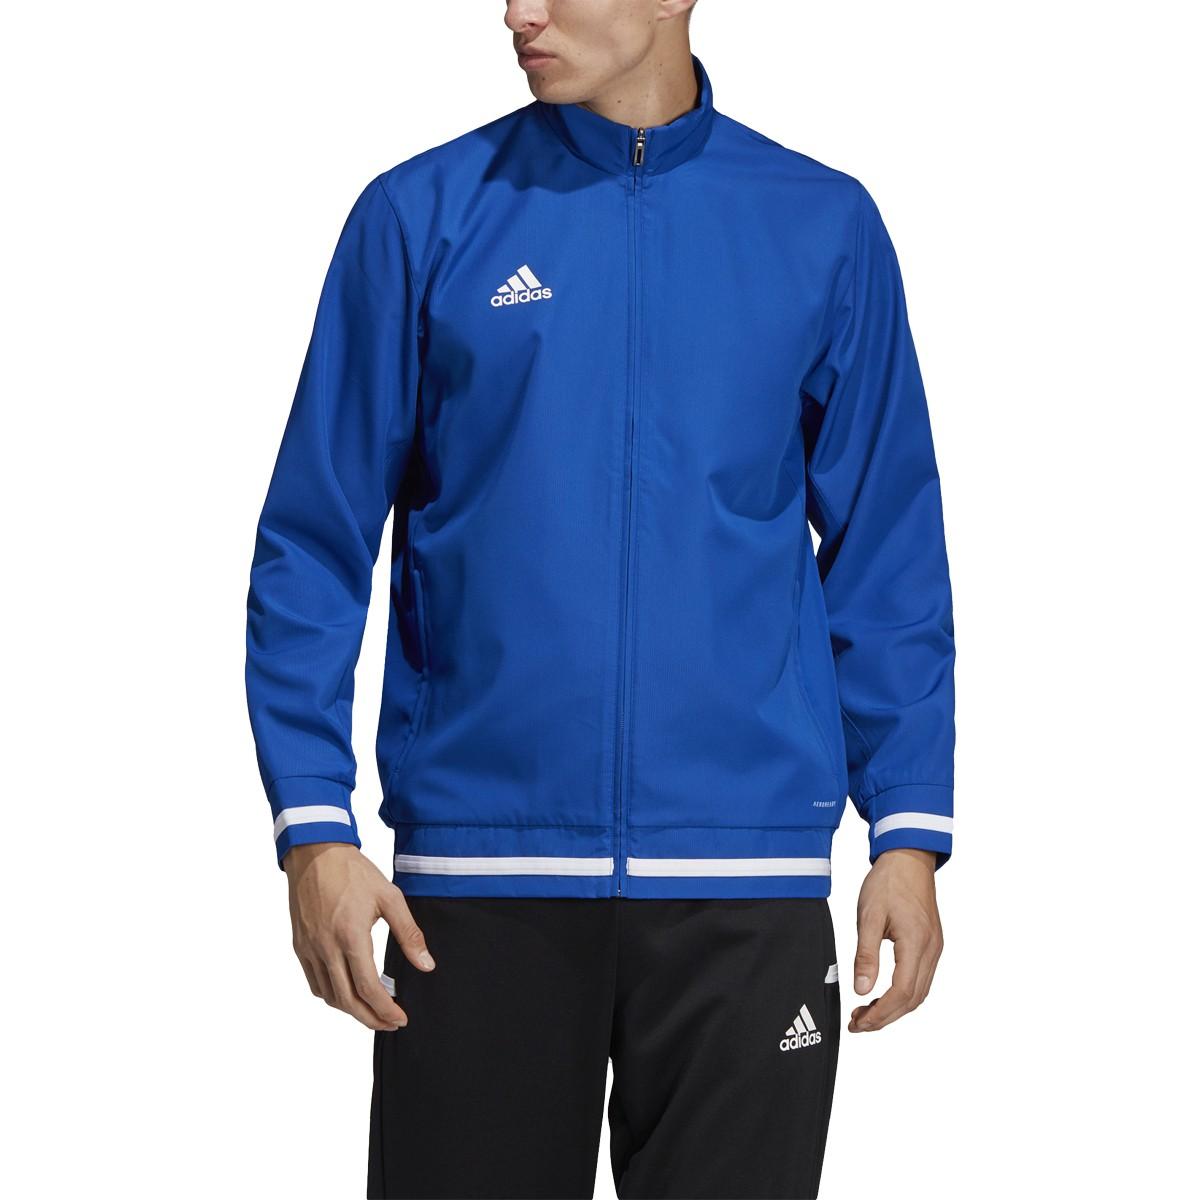 Adidas T19 Woven Jacket Mens